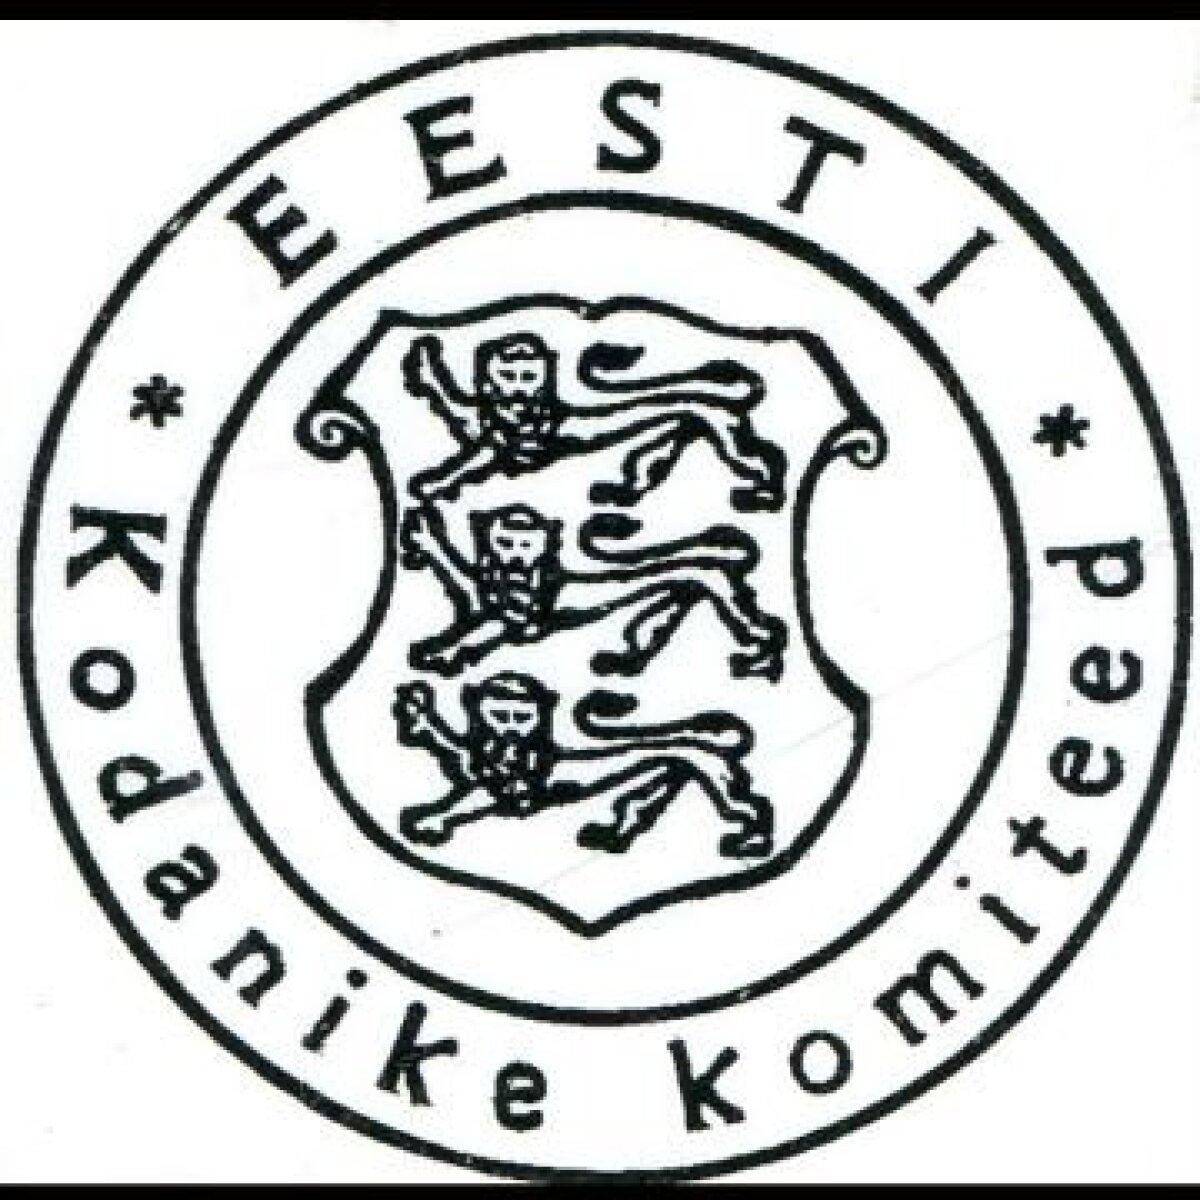 Eesti kodanike komiteede embleem.